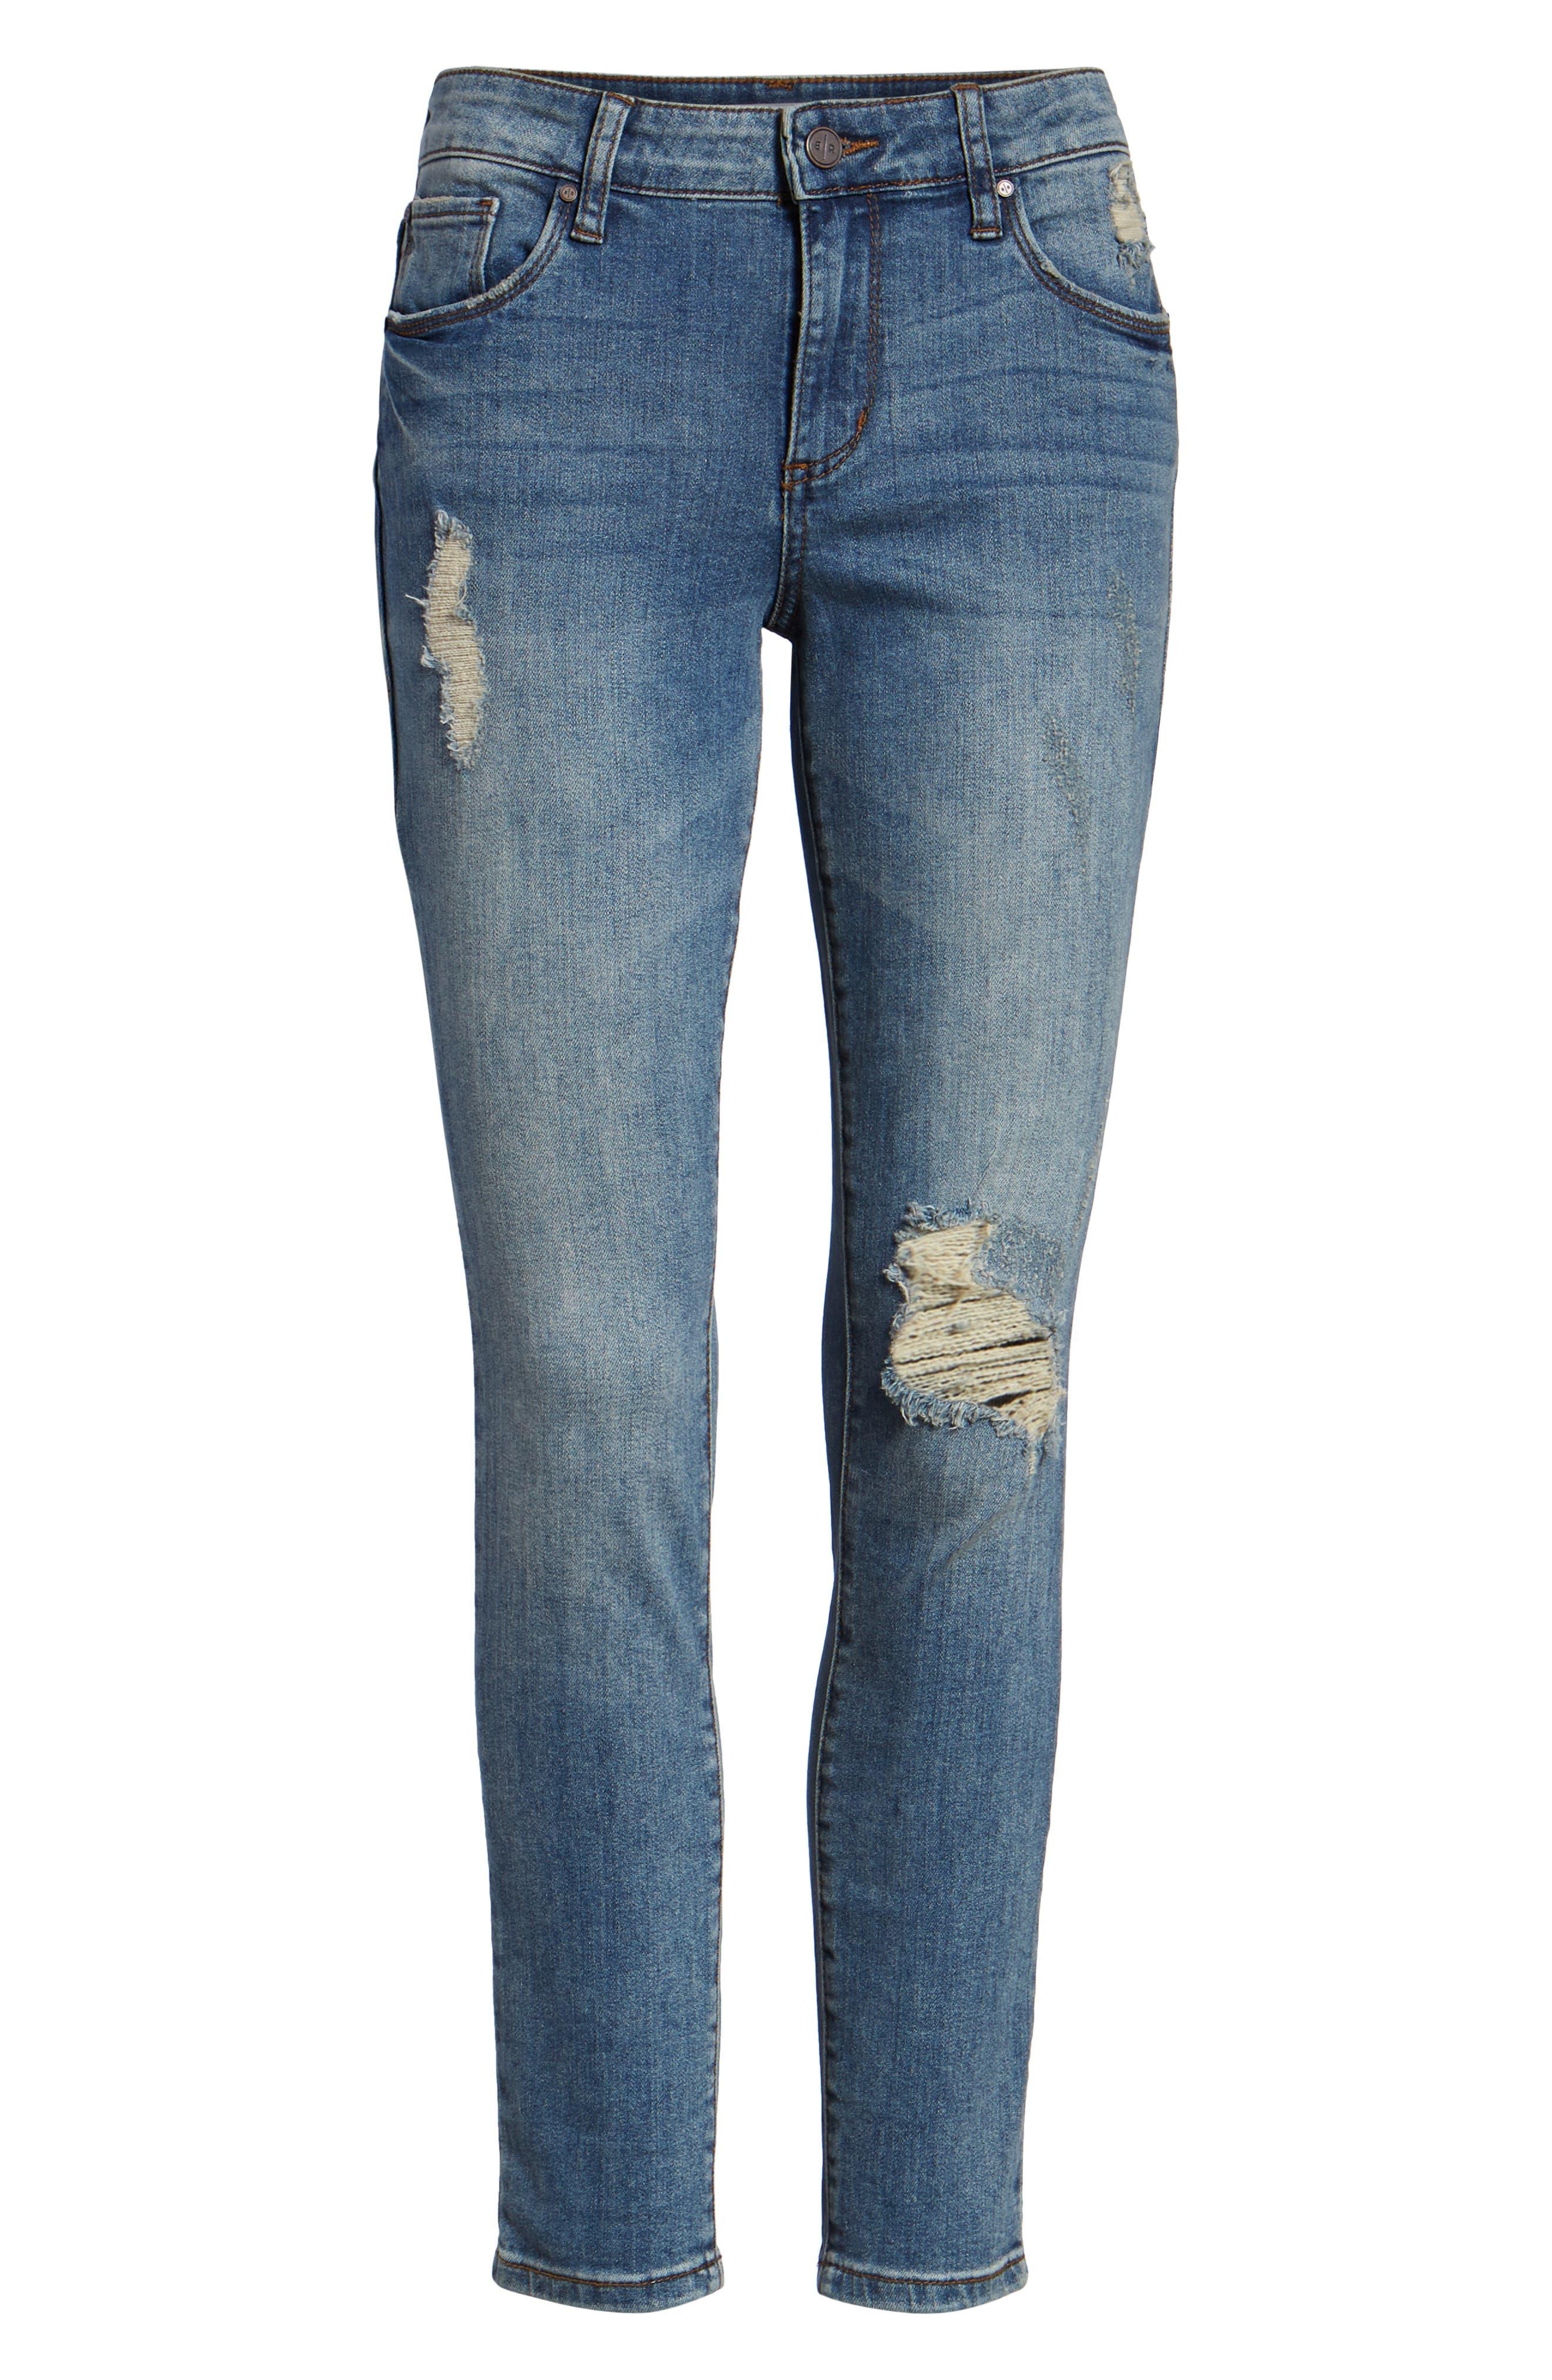 Distressed Skinny Jeans,                             Alternate thumbnail 7, color,                             LIGHT WASH